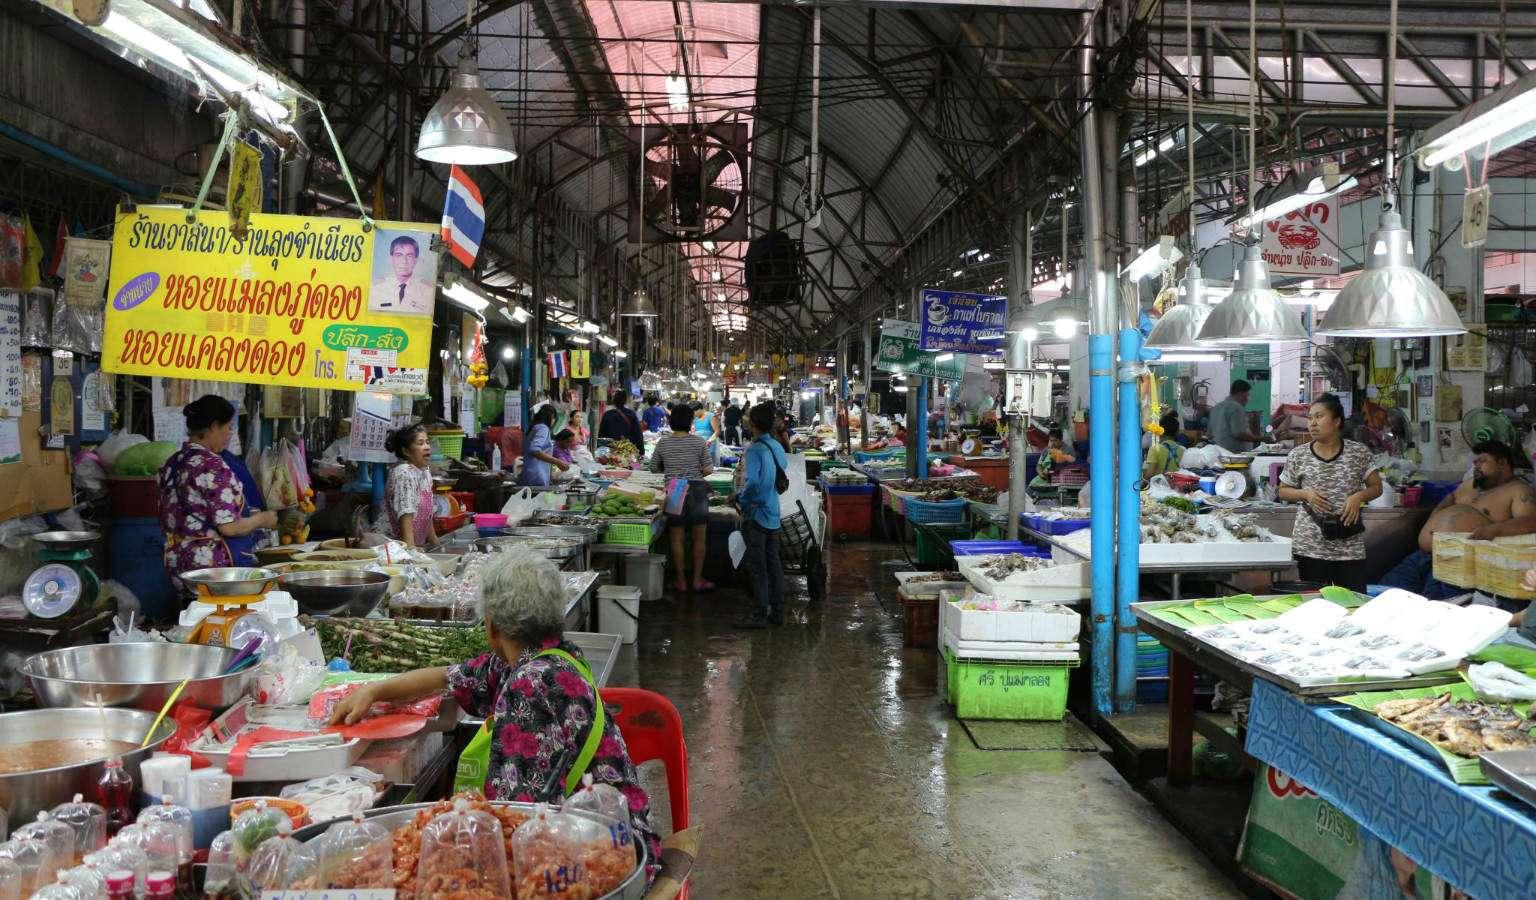 Maeklong Railway Markt in Thailand